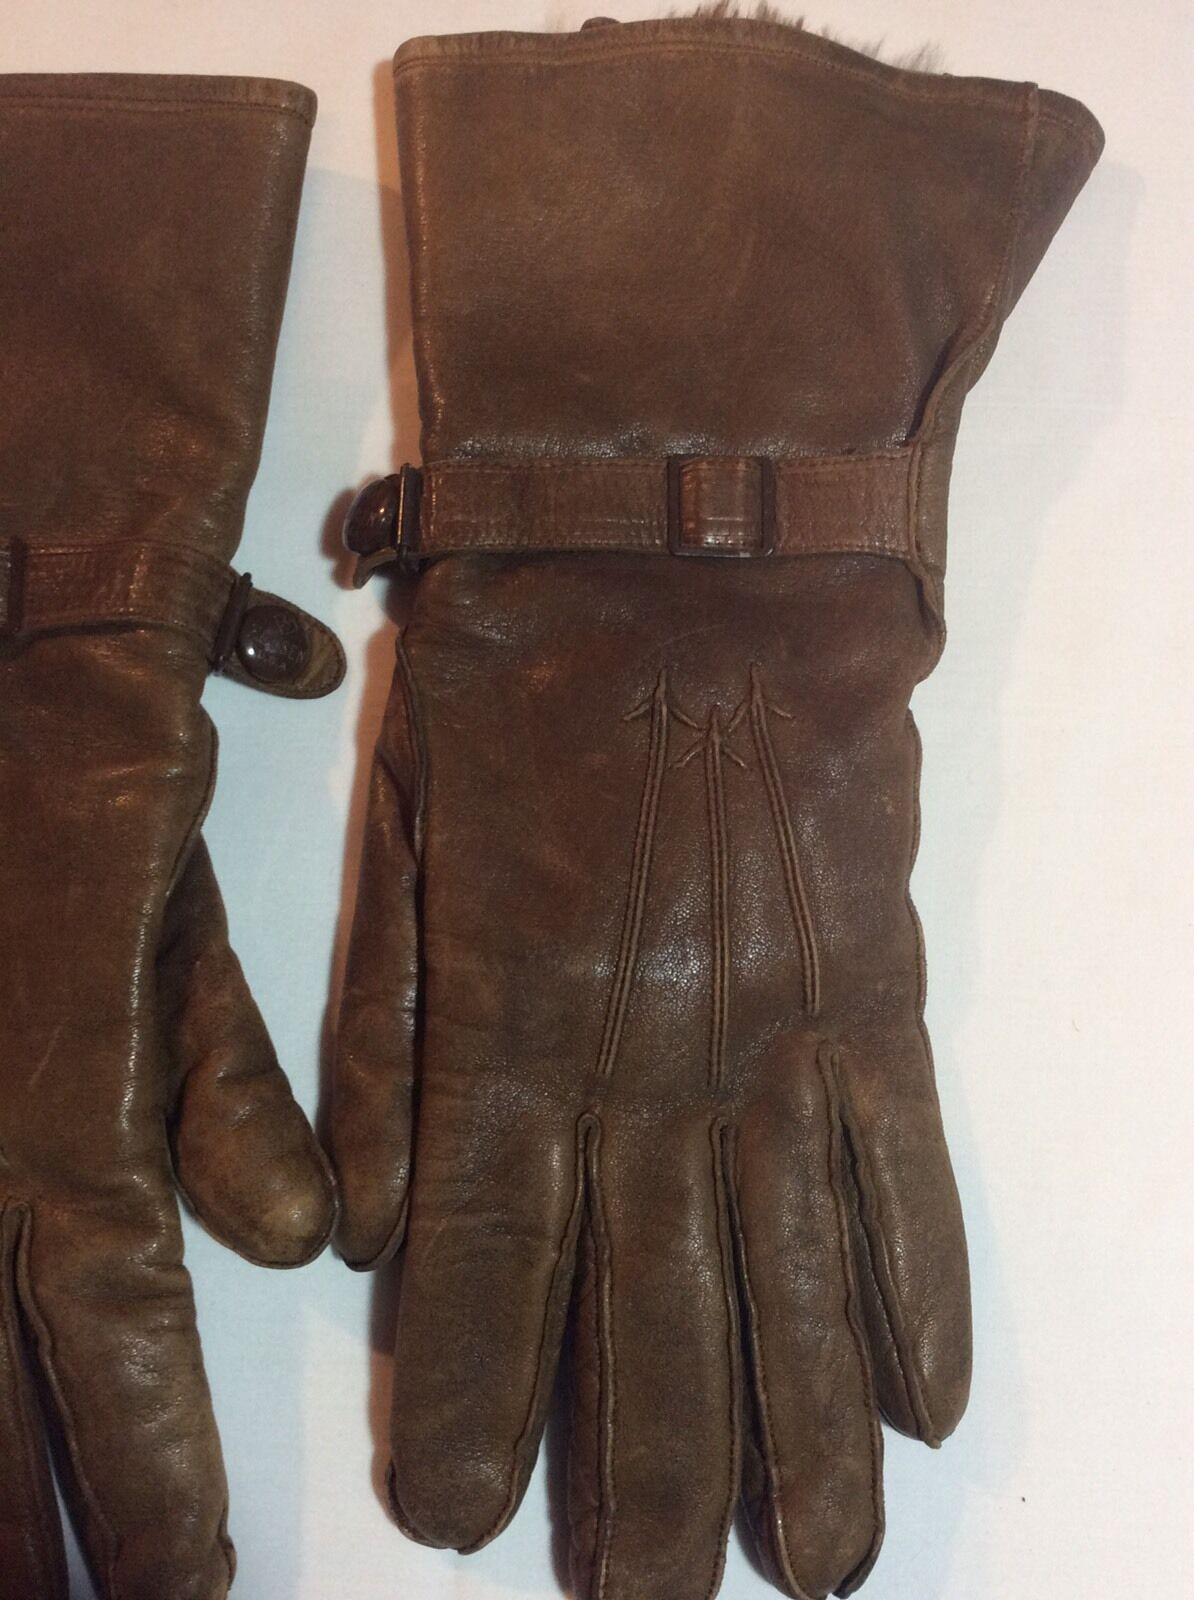 Vintage Hansen Ladies Leather Gauntlet Gloves - image 4